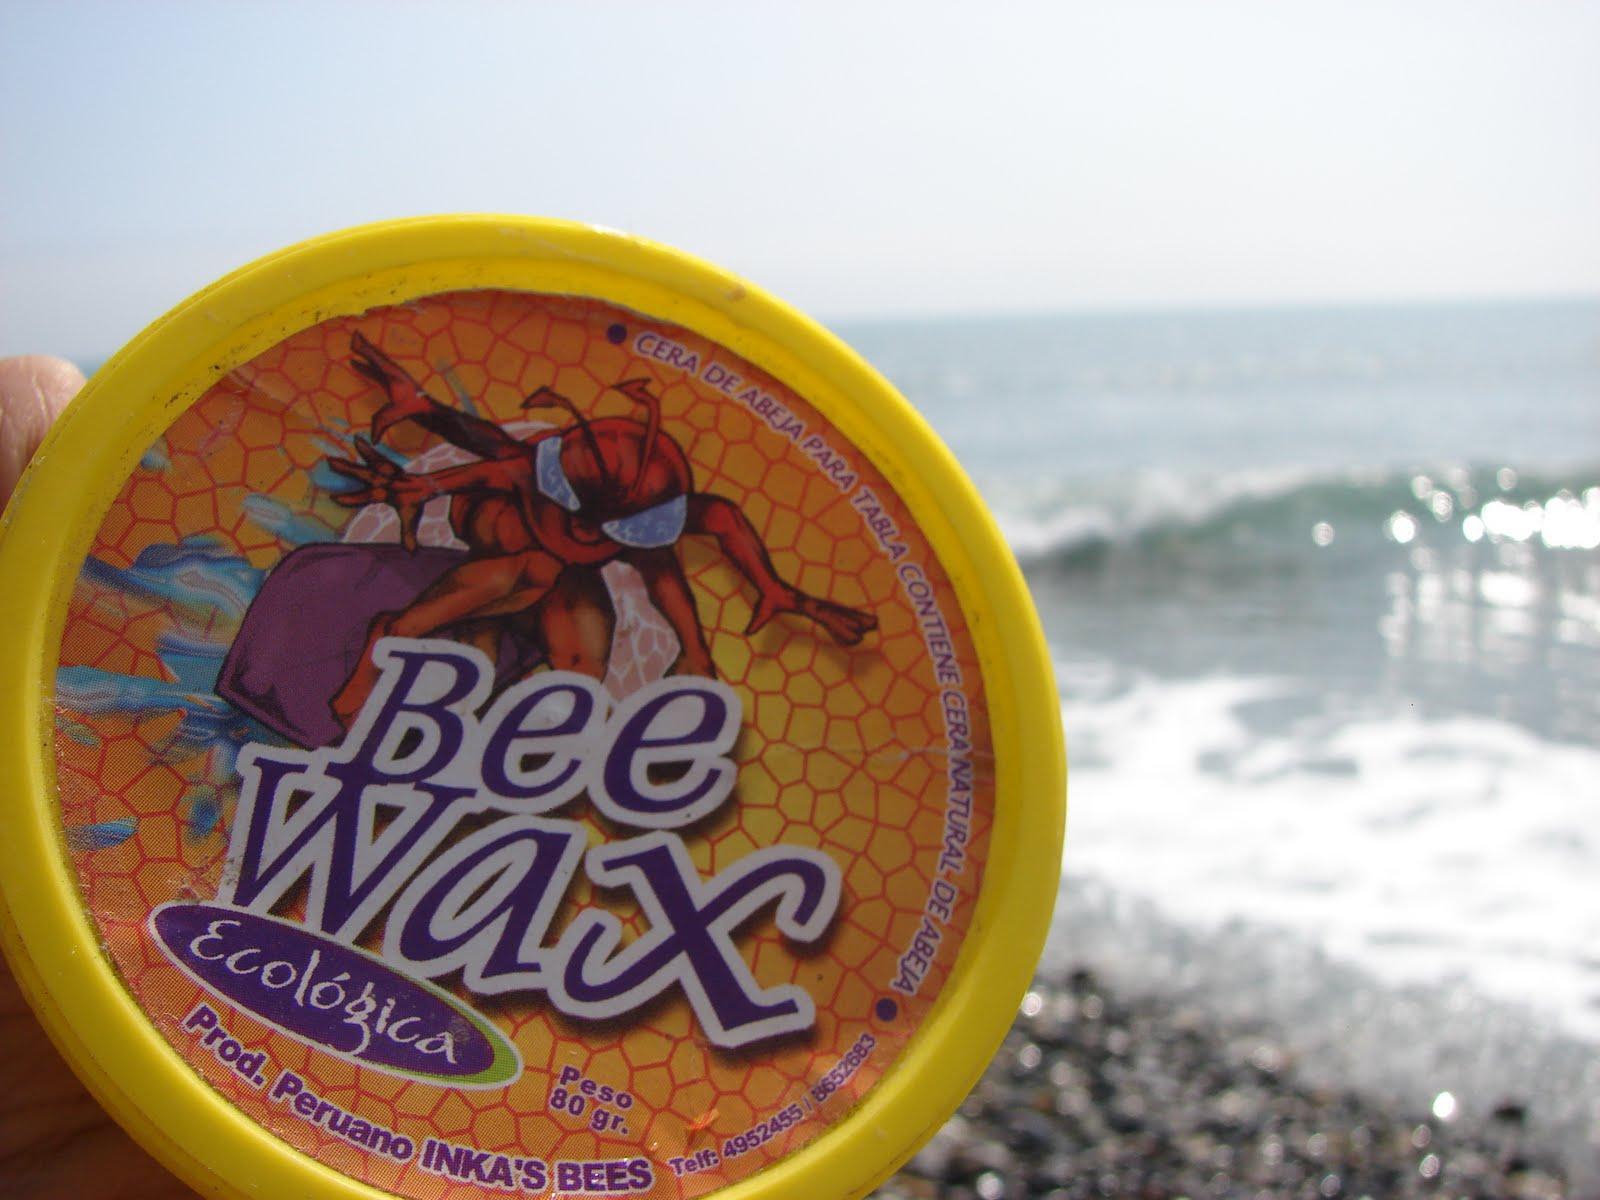 3-marzo-4-5-6-7....2012...BEE WAX cera 100005 Peruana , SURF,BODYBOARD,SKATE,sec.ufo..